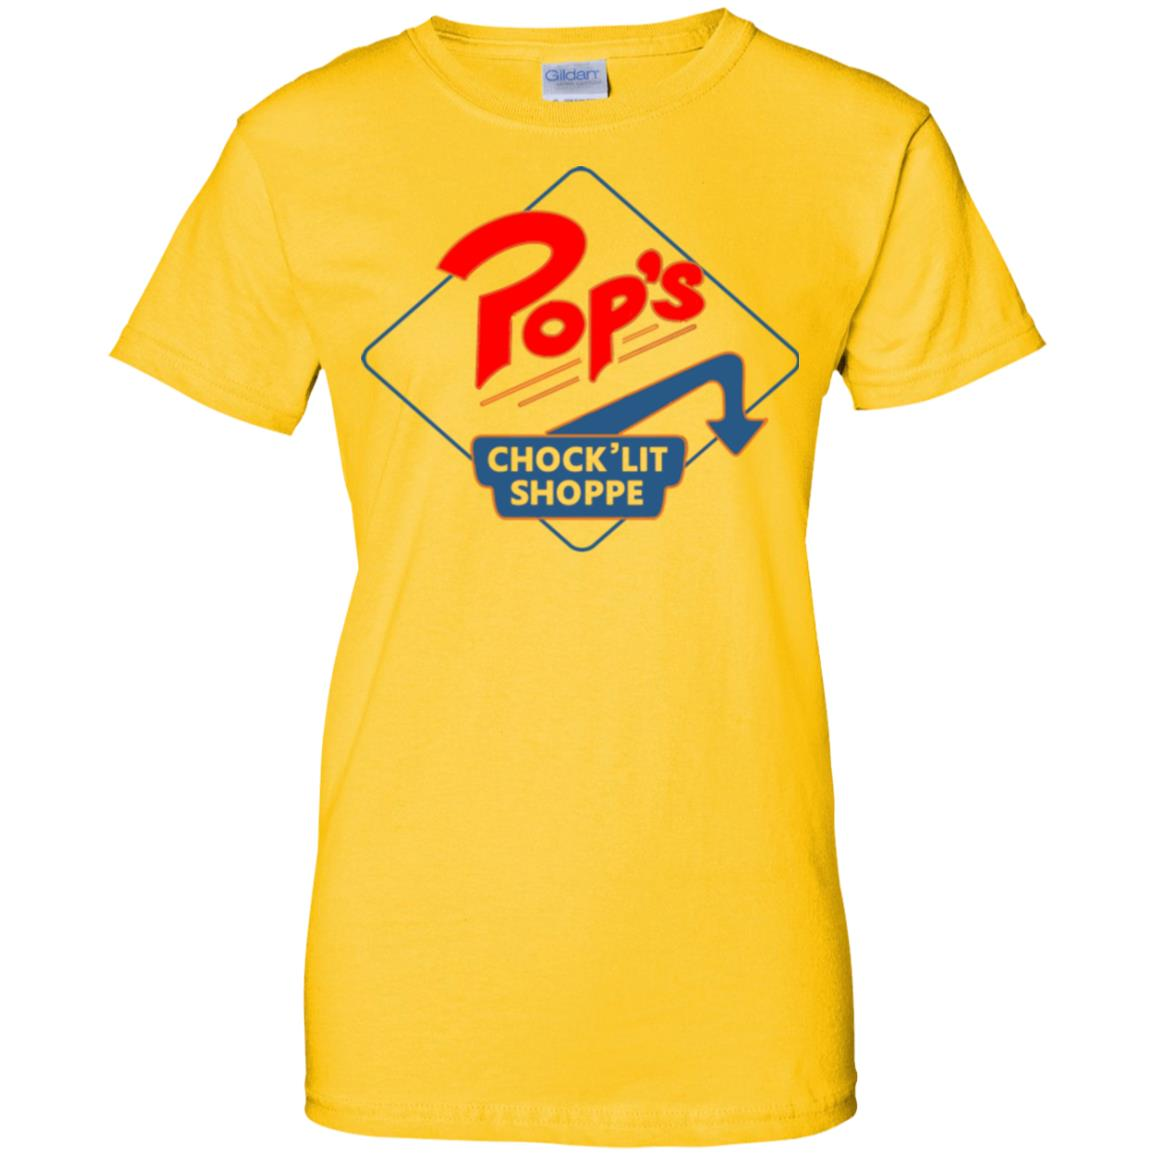 image 2092 - Riverdale Pop's Chock'lit Shoppe shirt